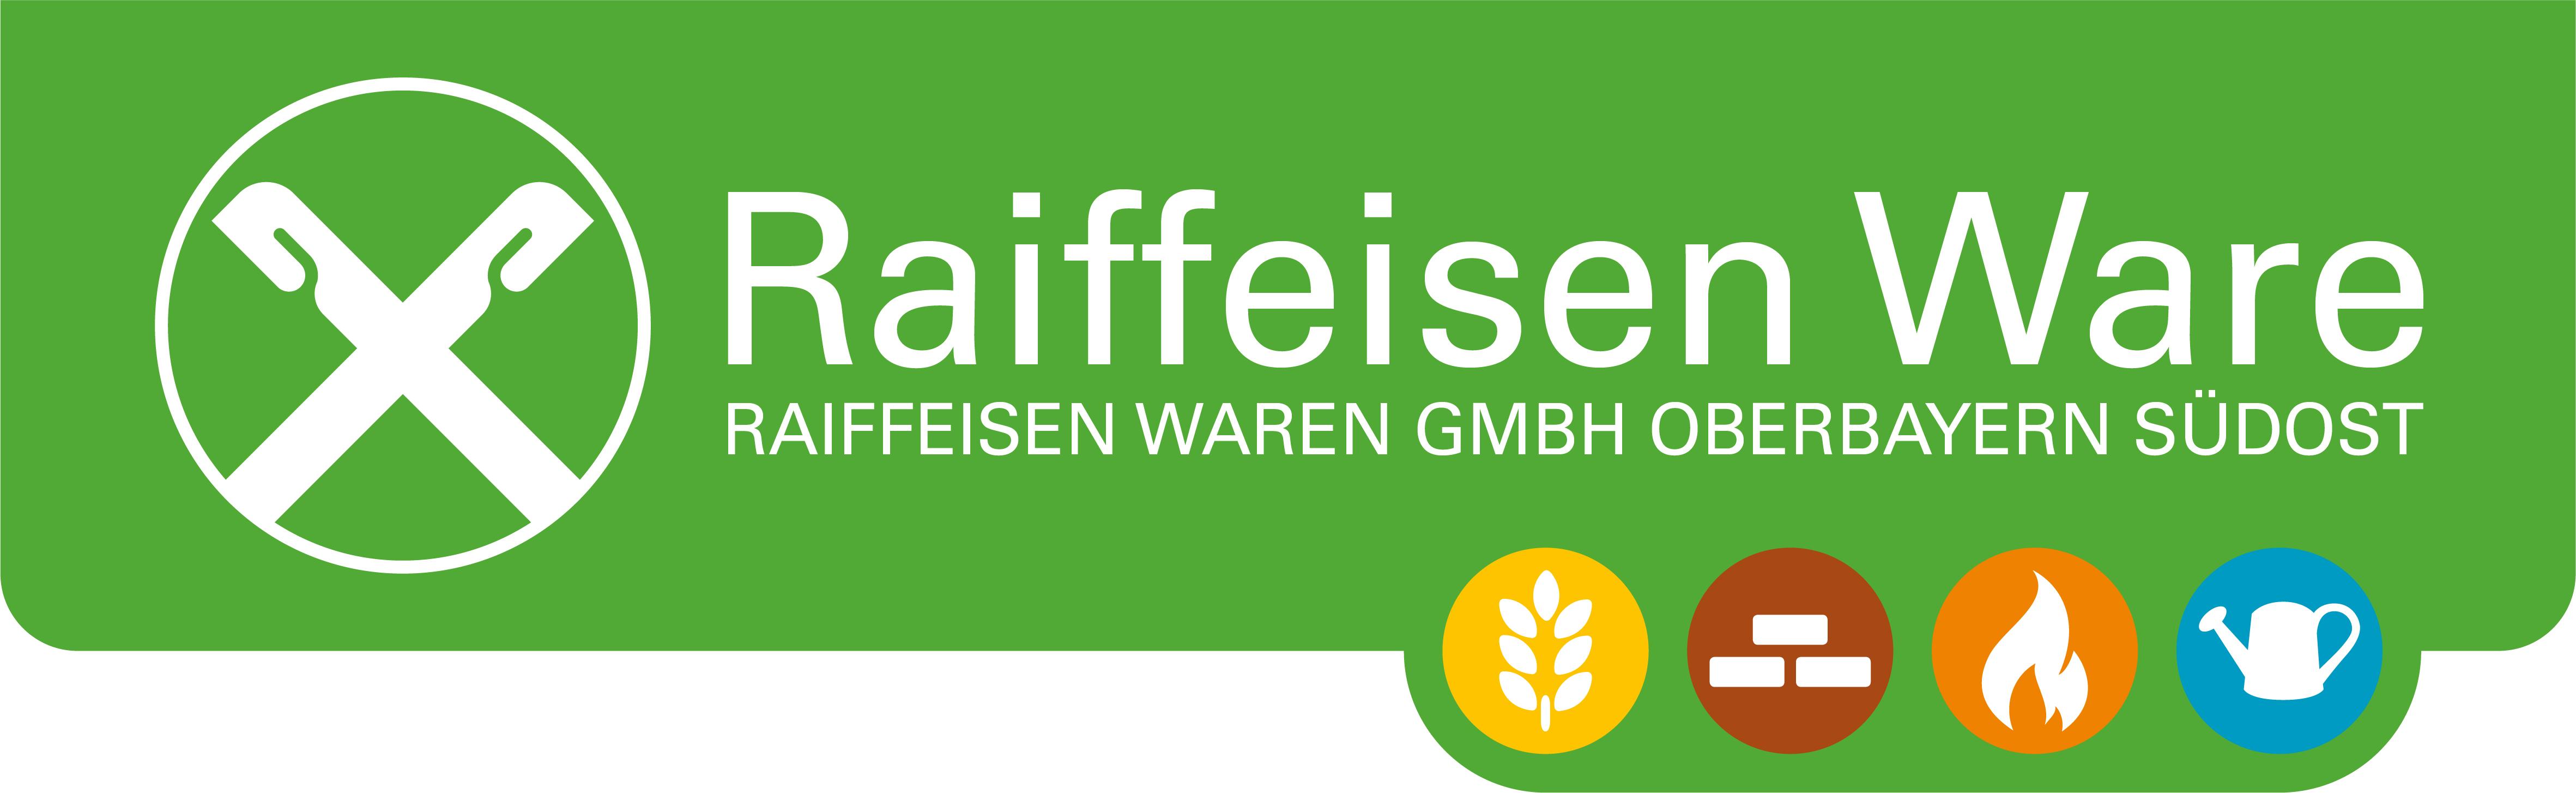 Raiffeisen Waren GmbH Oberbayern Südost - Hauptstandort Fridolfing Fridolfing